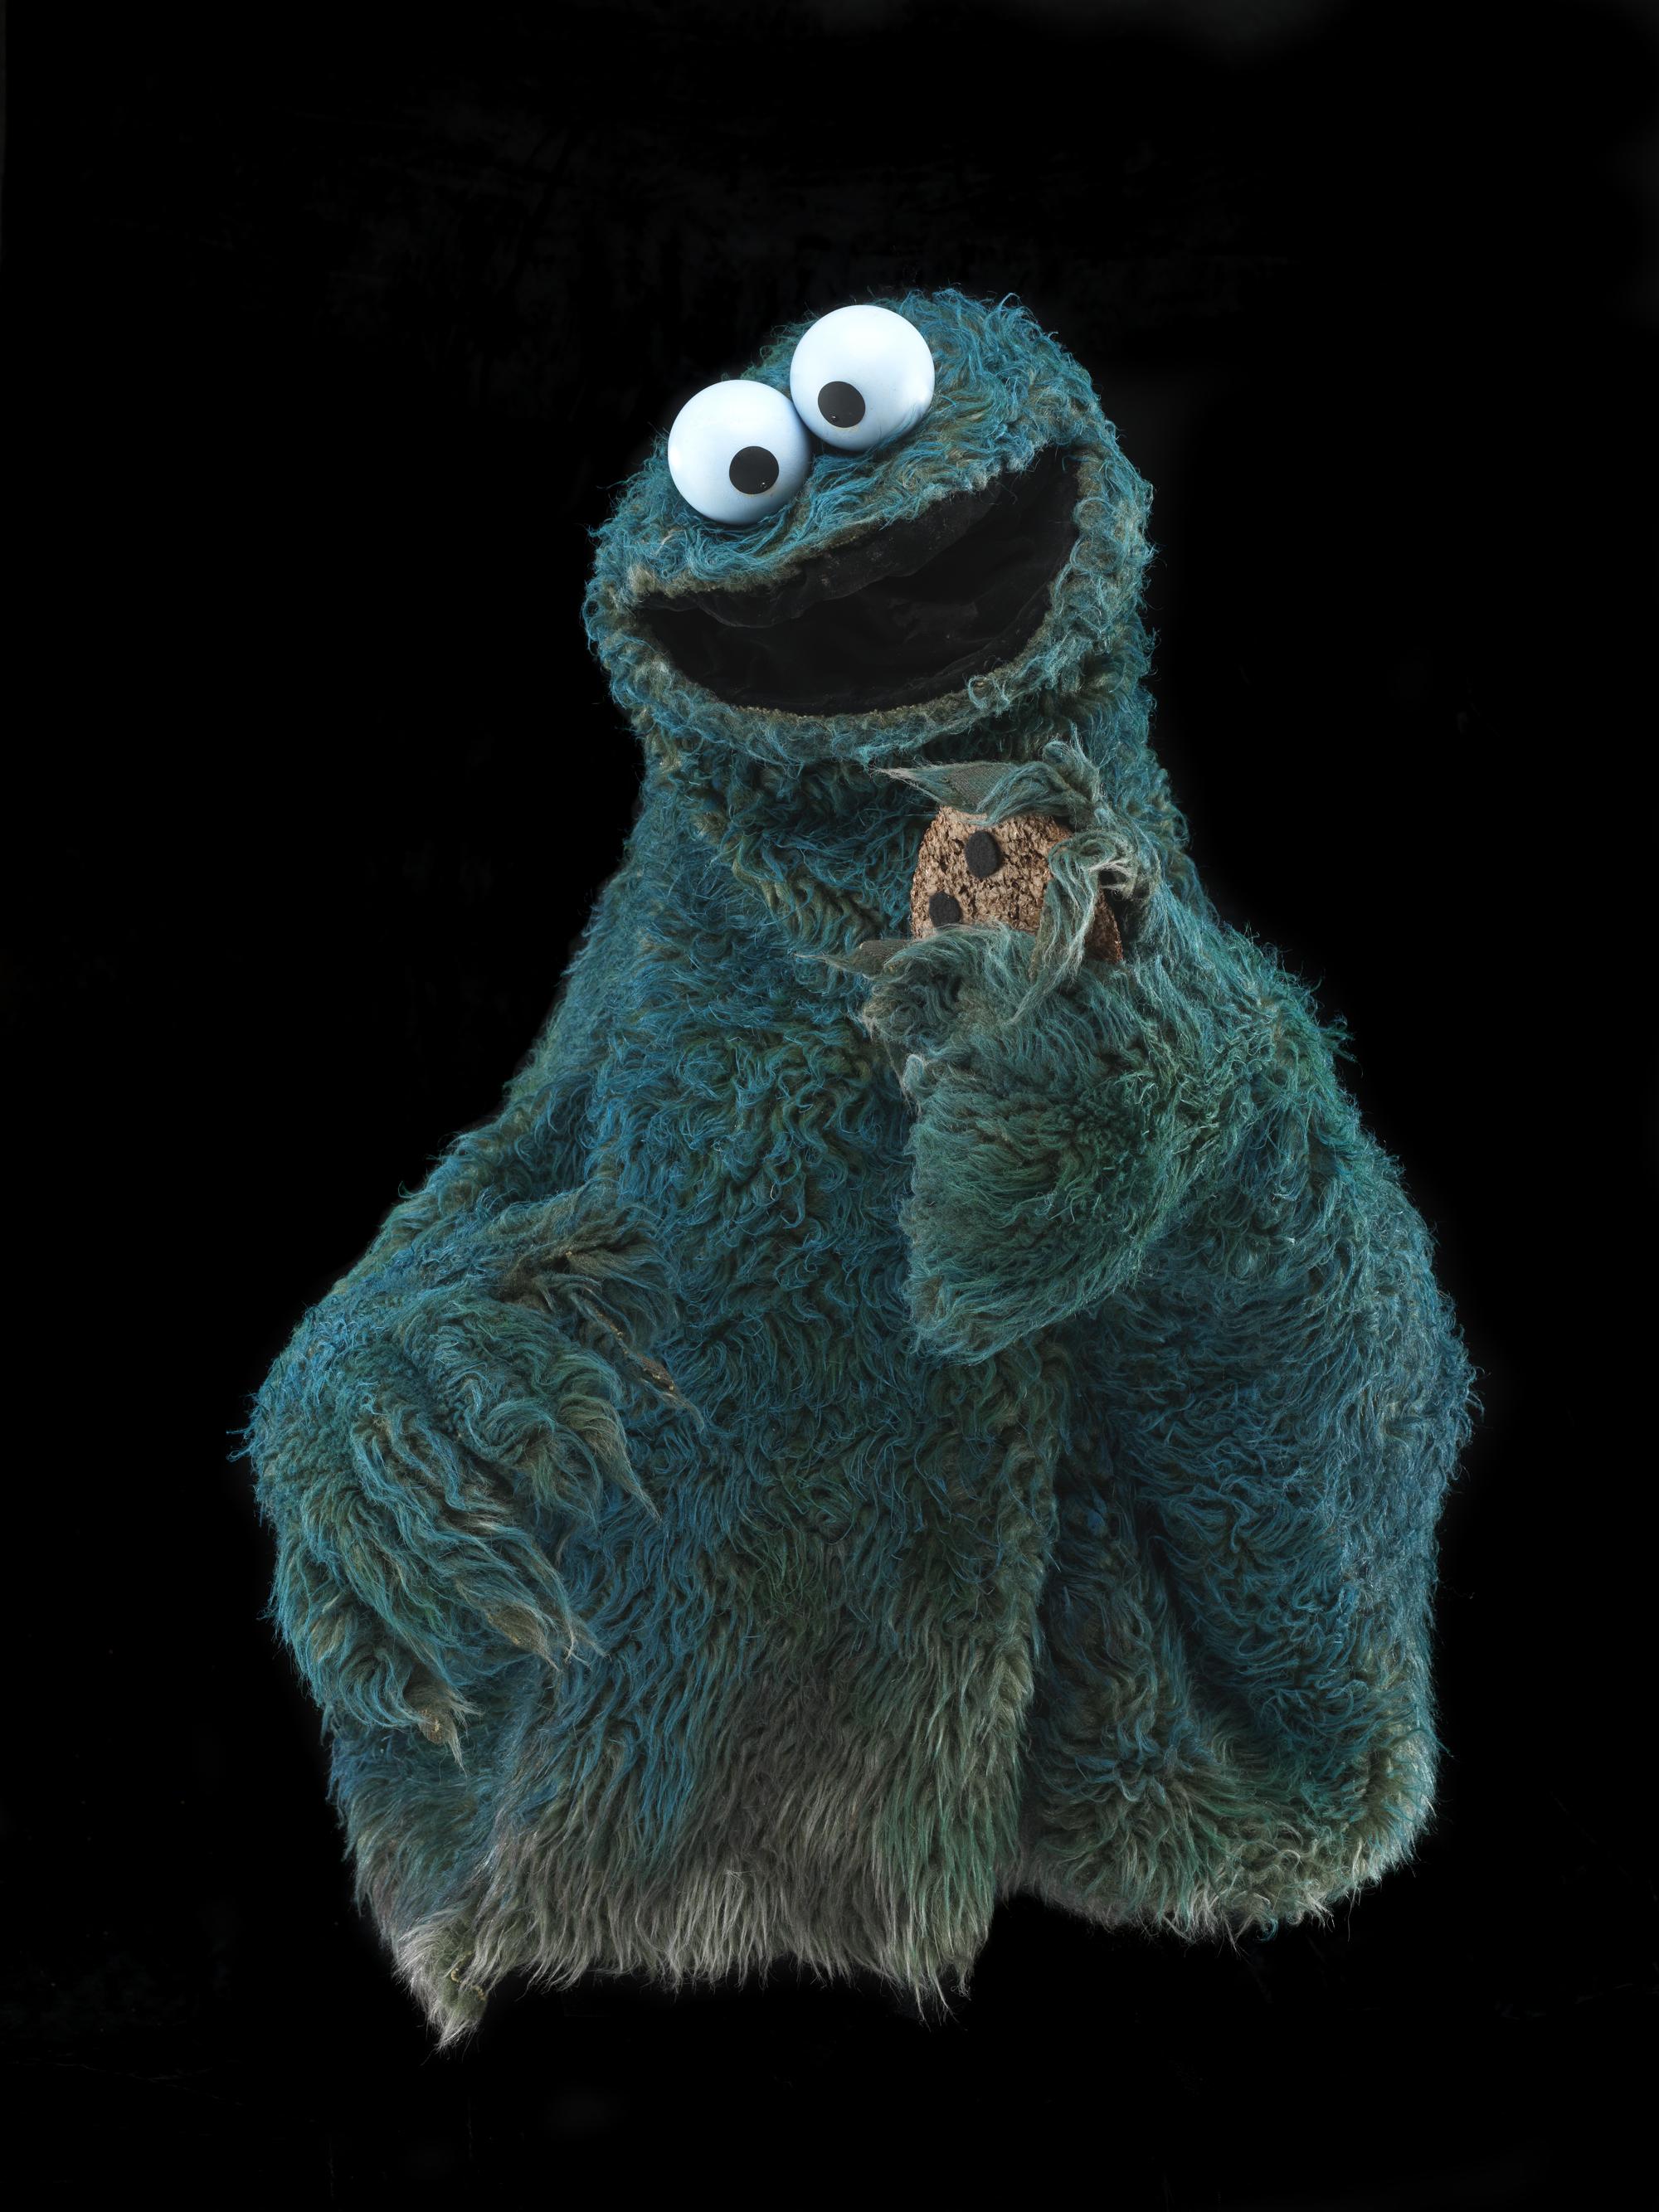 Cookie Monster - Muppet Wiki